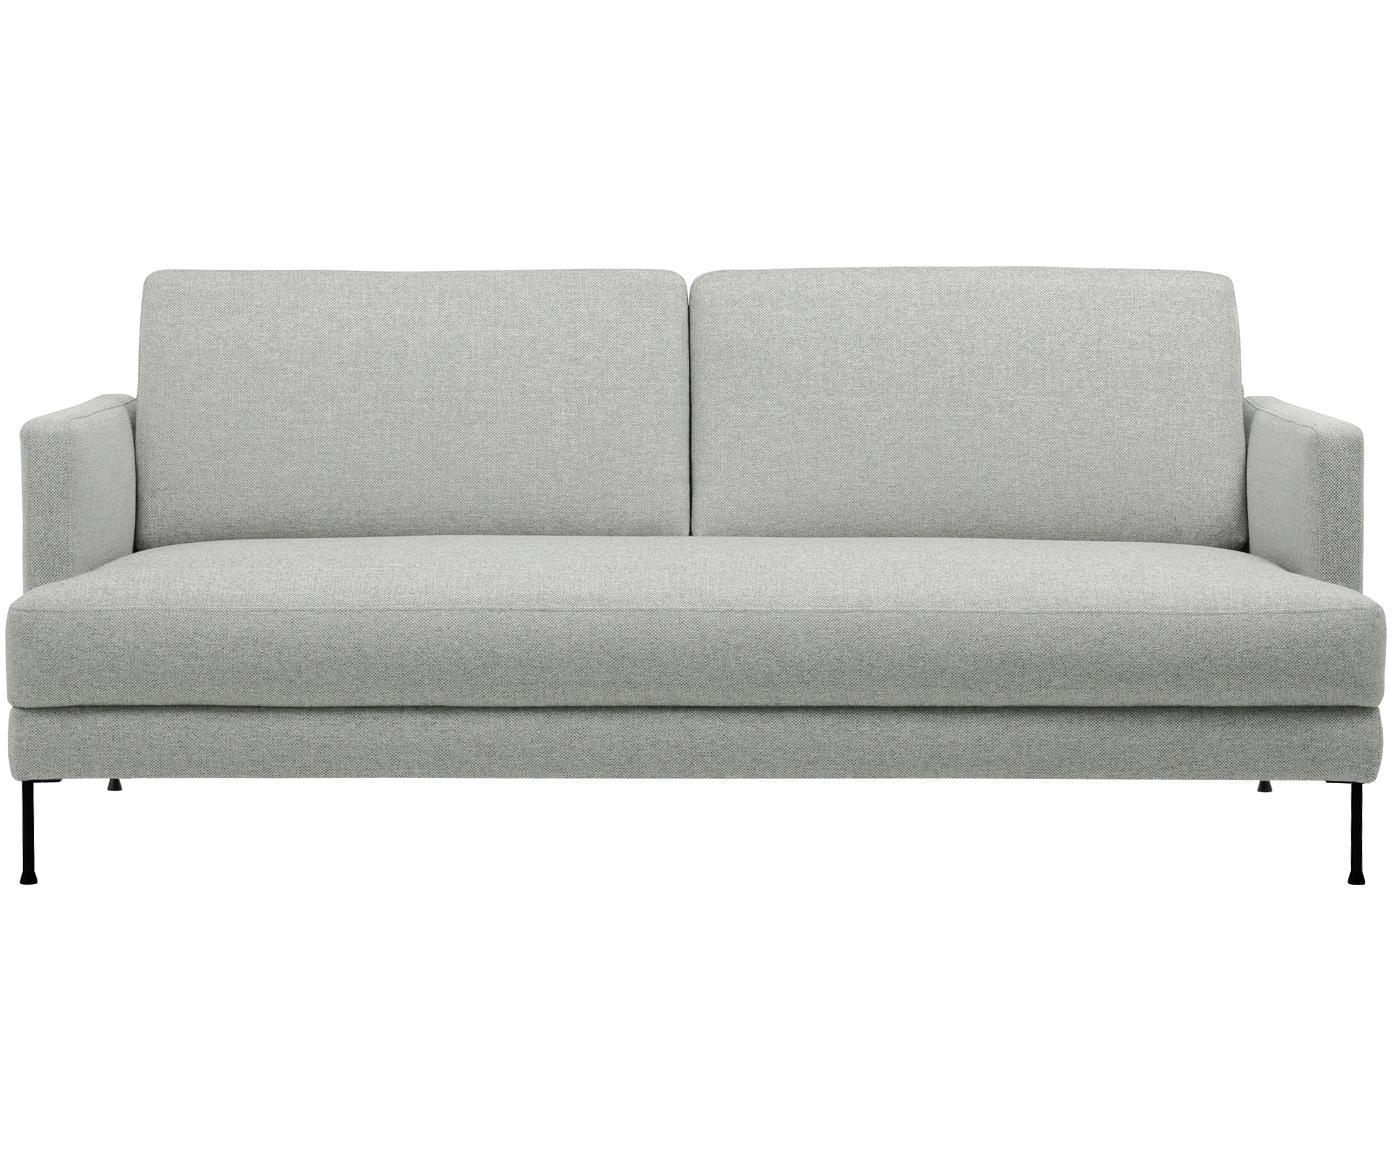 Bank Fluente (3-zits), Bekleding: polyester, Frame: massief grenenhout, Poten: gelakt metaal, Lichtgrijs, 197 x 85 cm